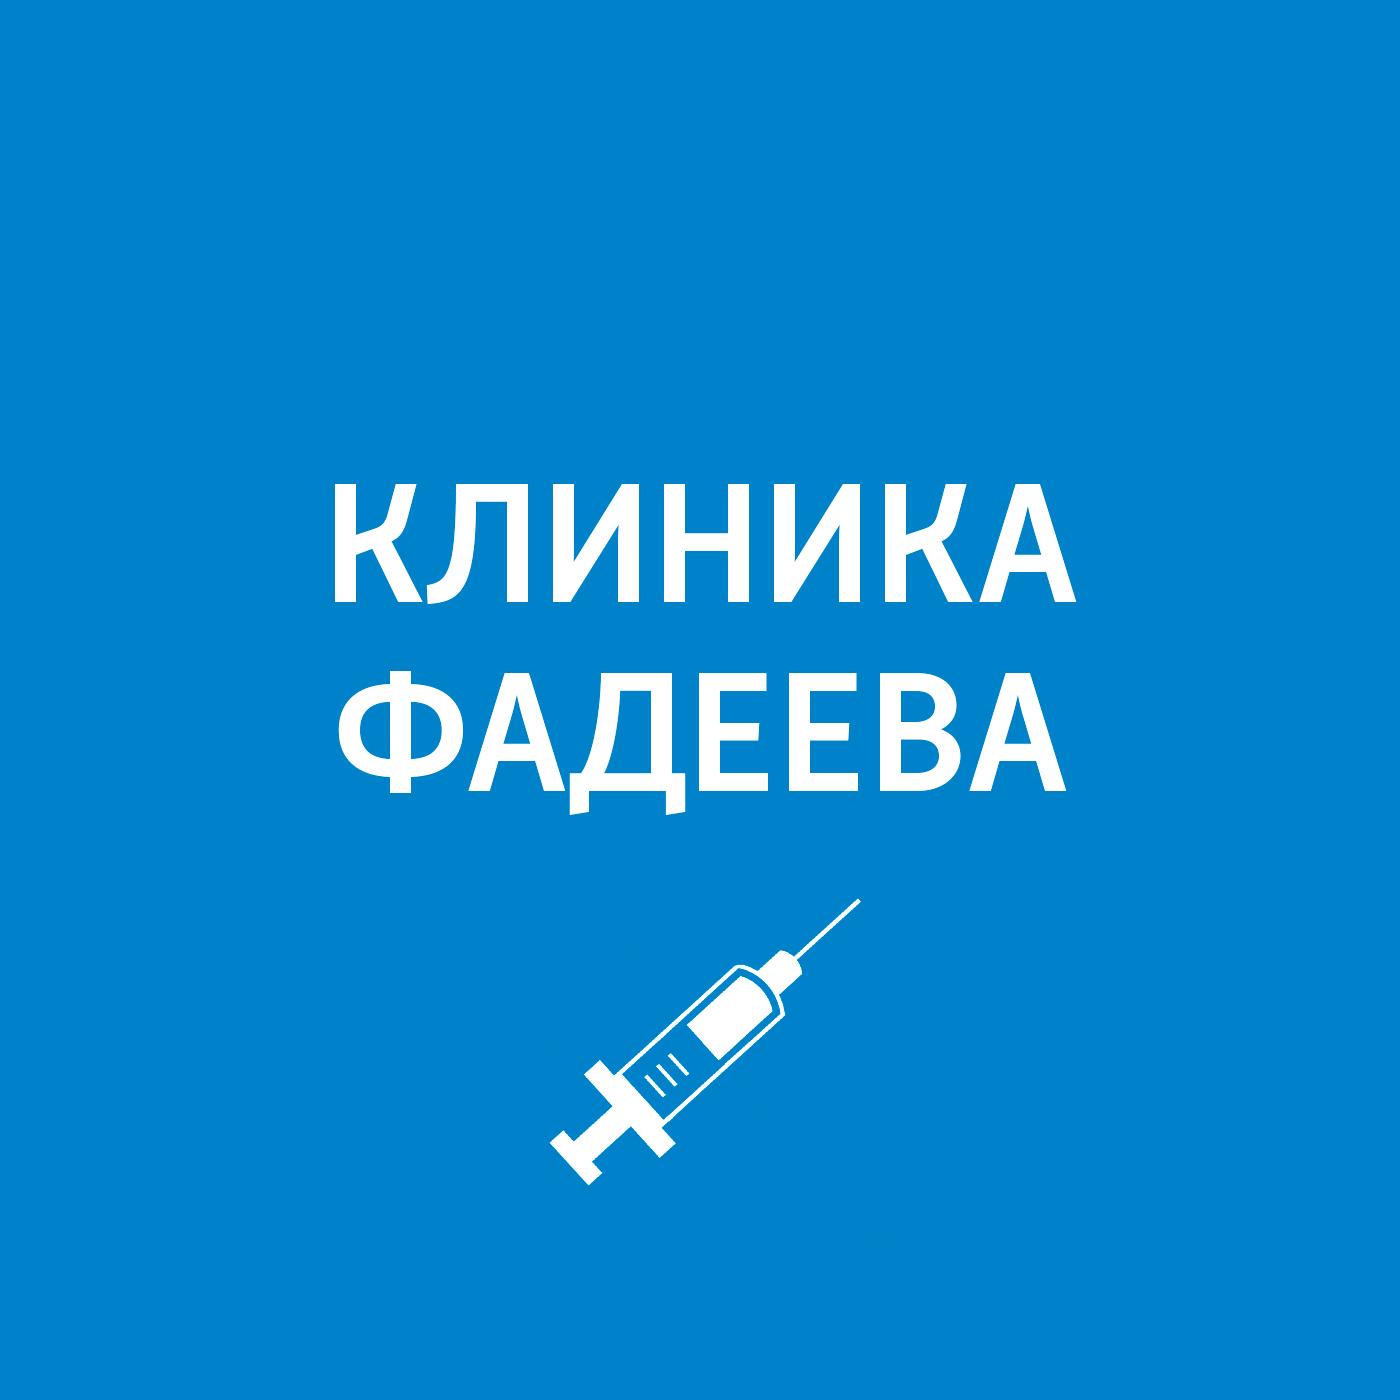 Пётр Фадеев Аллергия пётр фадеев ветеринар герпетолог